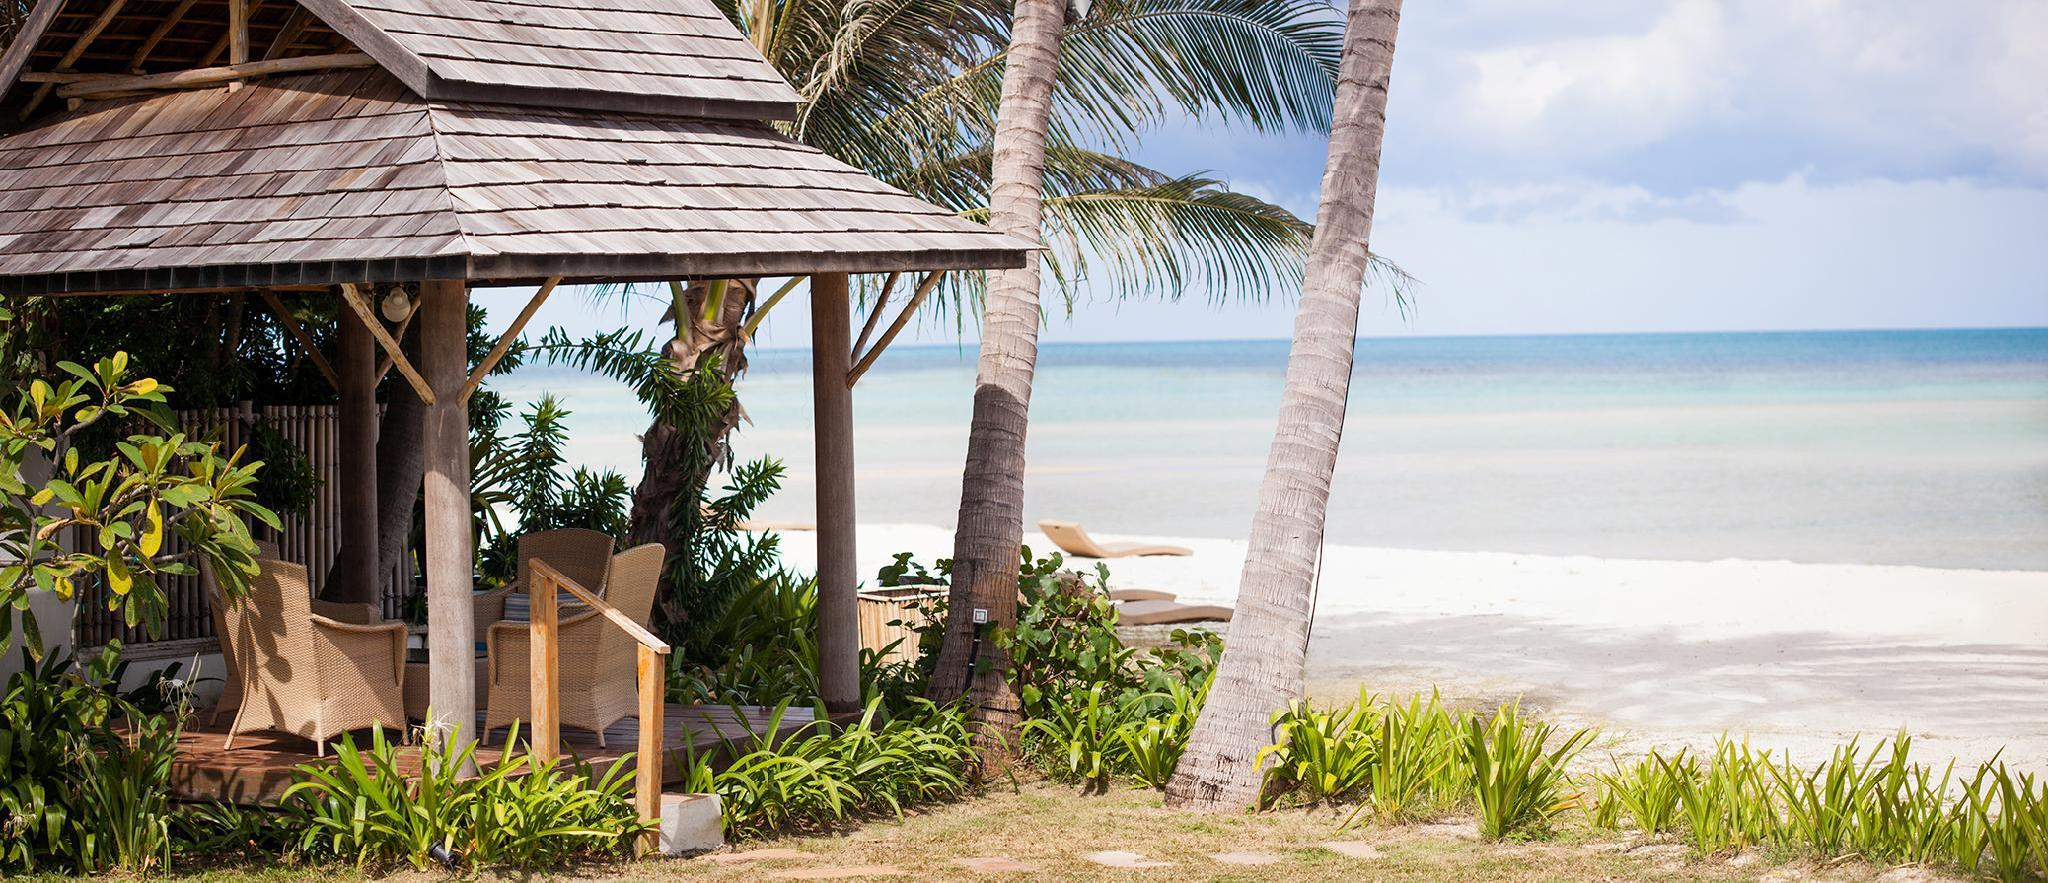 Stunning Beachfront Villa  Baan Rim Haad 3BR 3 ห้องนอน 4 ห้องน้ำส่วนตัว ขนาด 170 ตร.ม. – หัวถนน